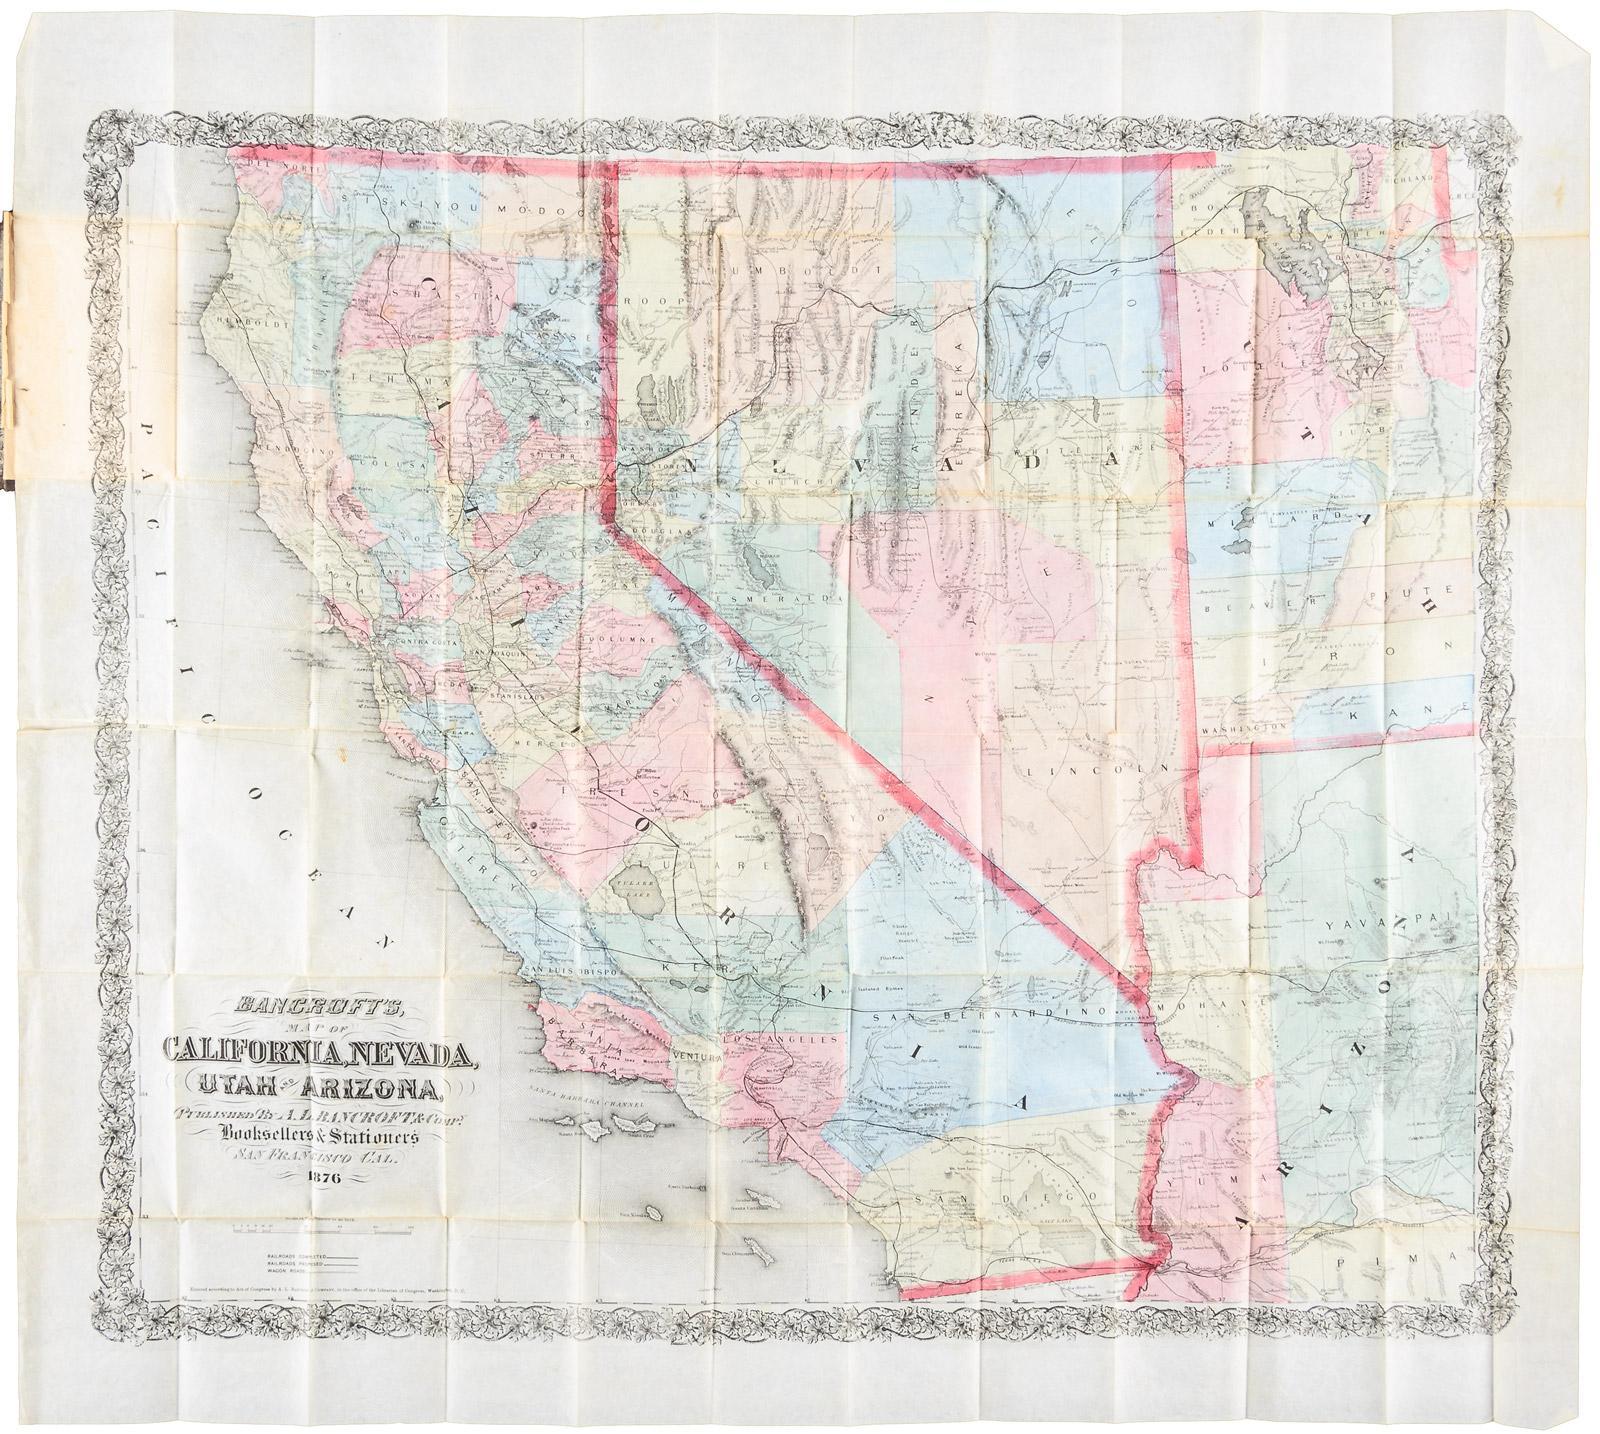 Map Of California Arizona Border.Bancroft S Map Of California Nevada Utah And Arizona Published By